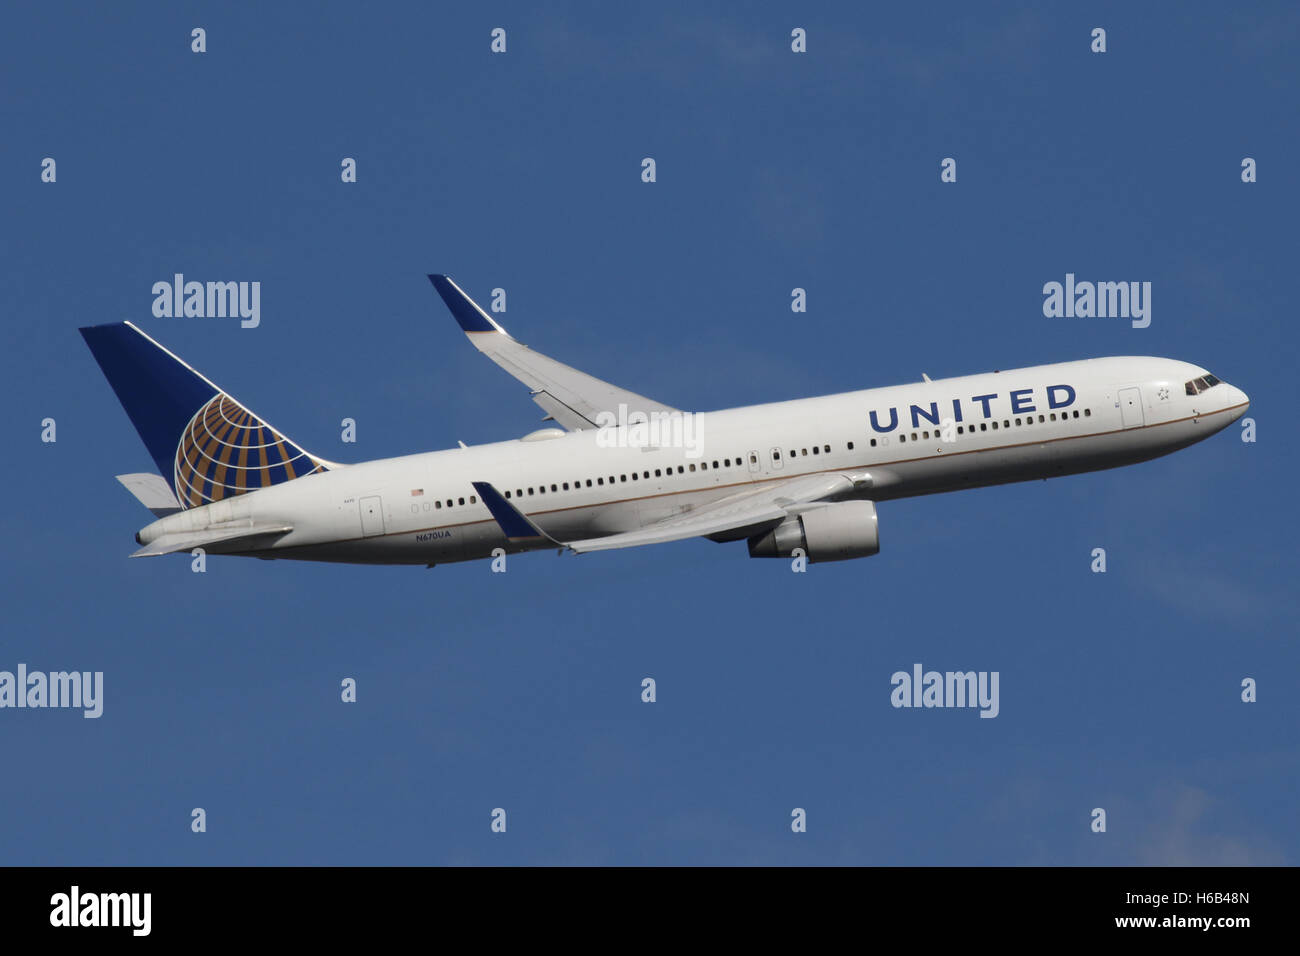 UNITED 767 WINGLETS - Stock Image